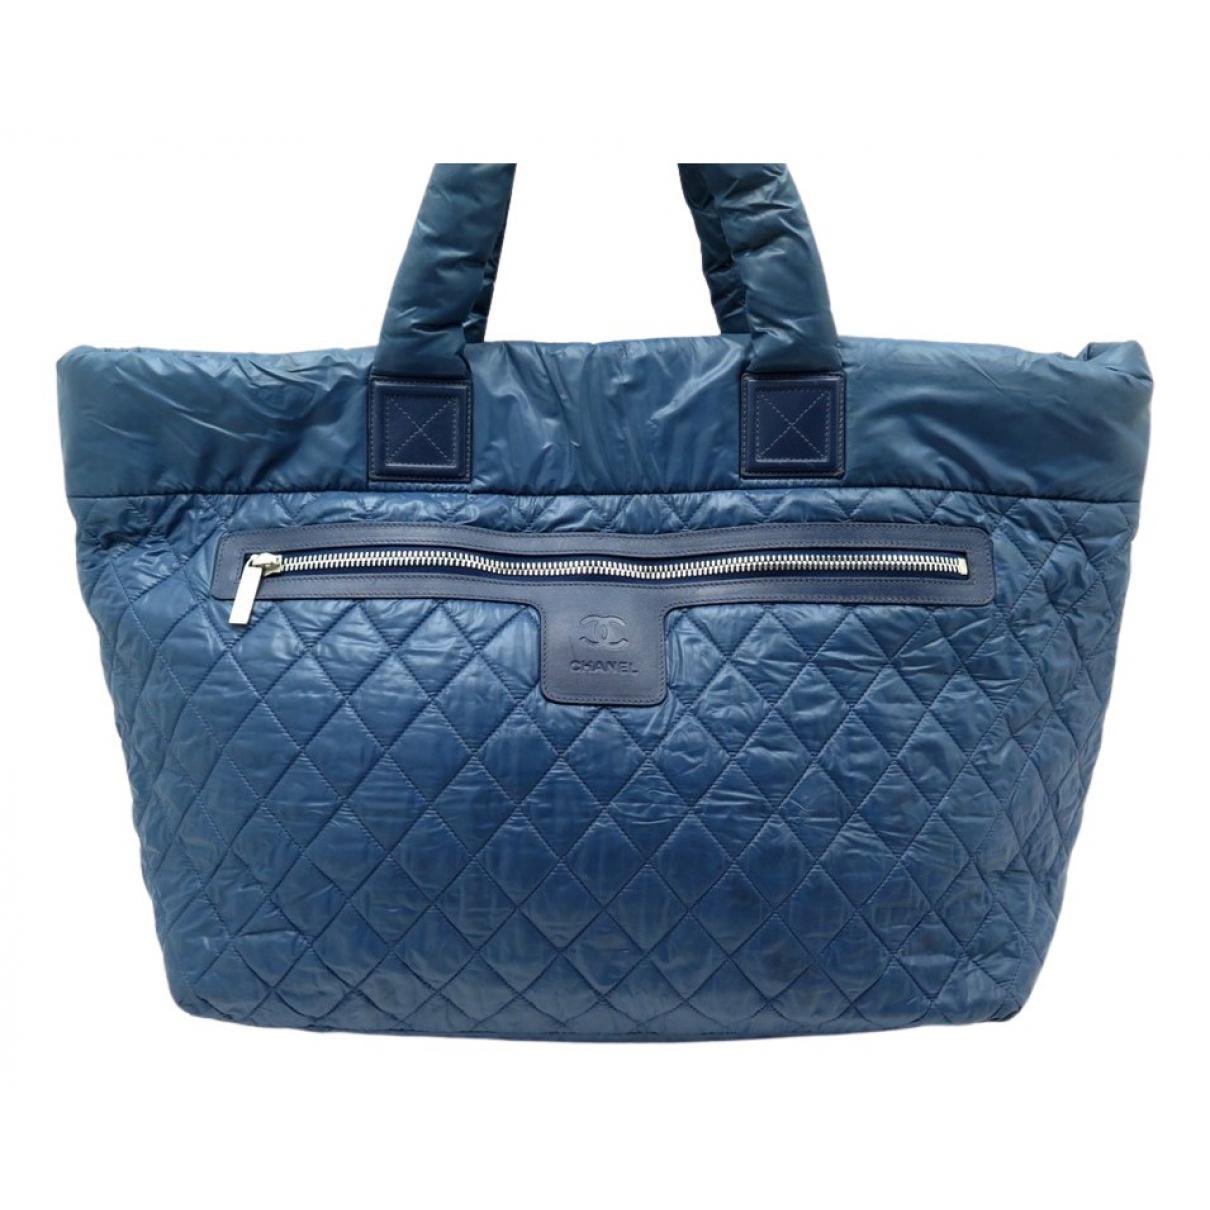 Chanel Coco Cocoon Handtasche in  Blau Leder